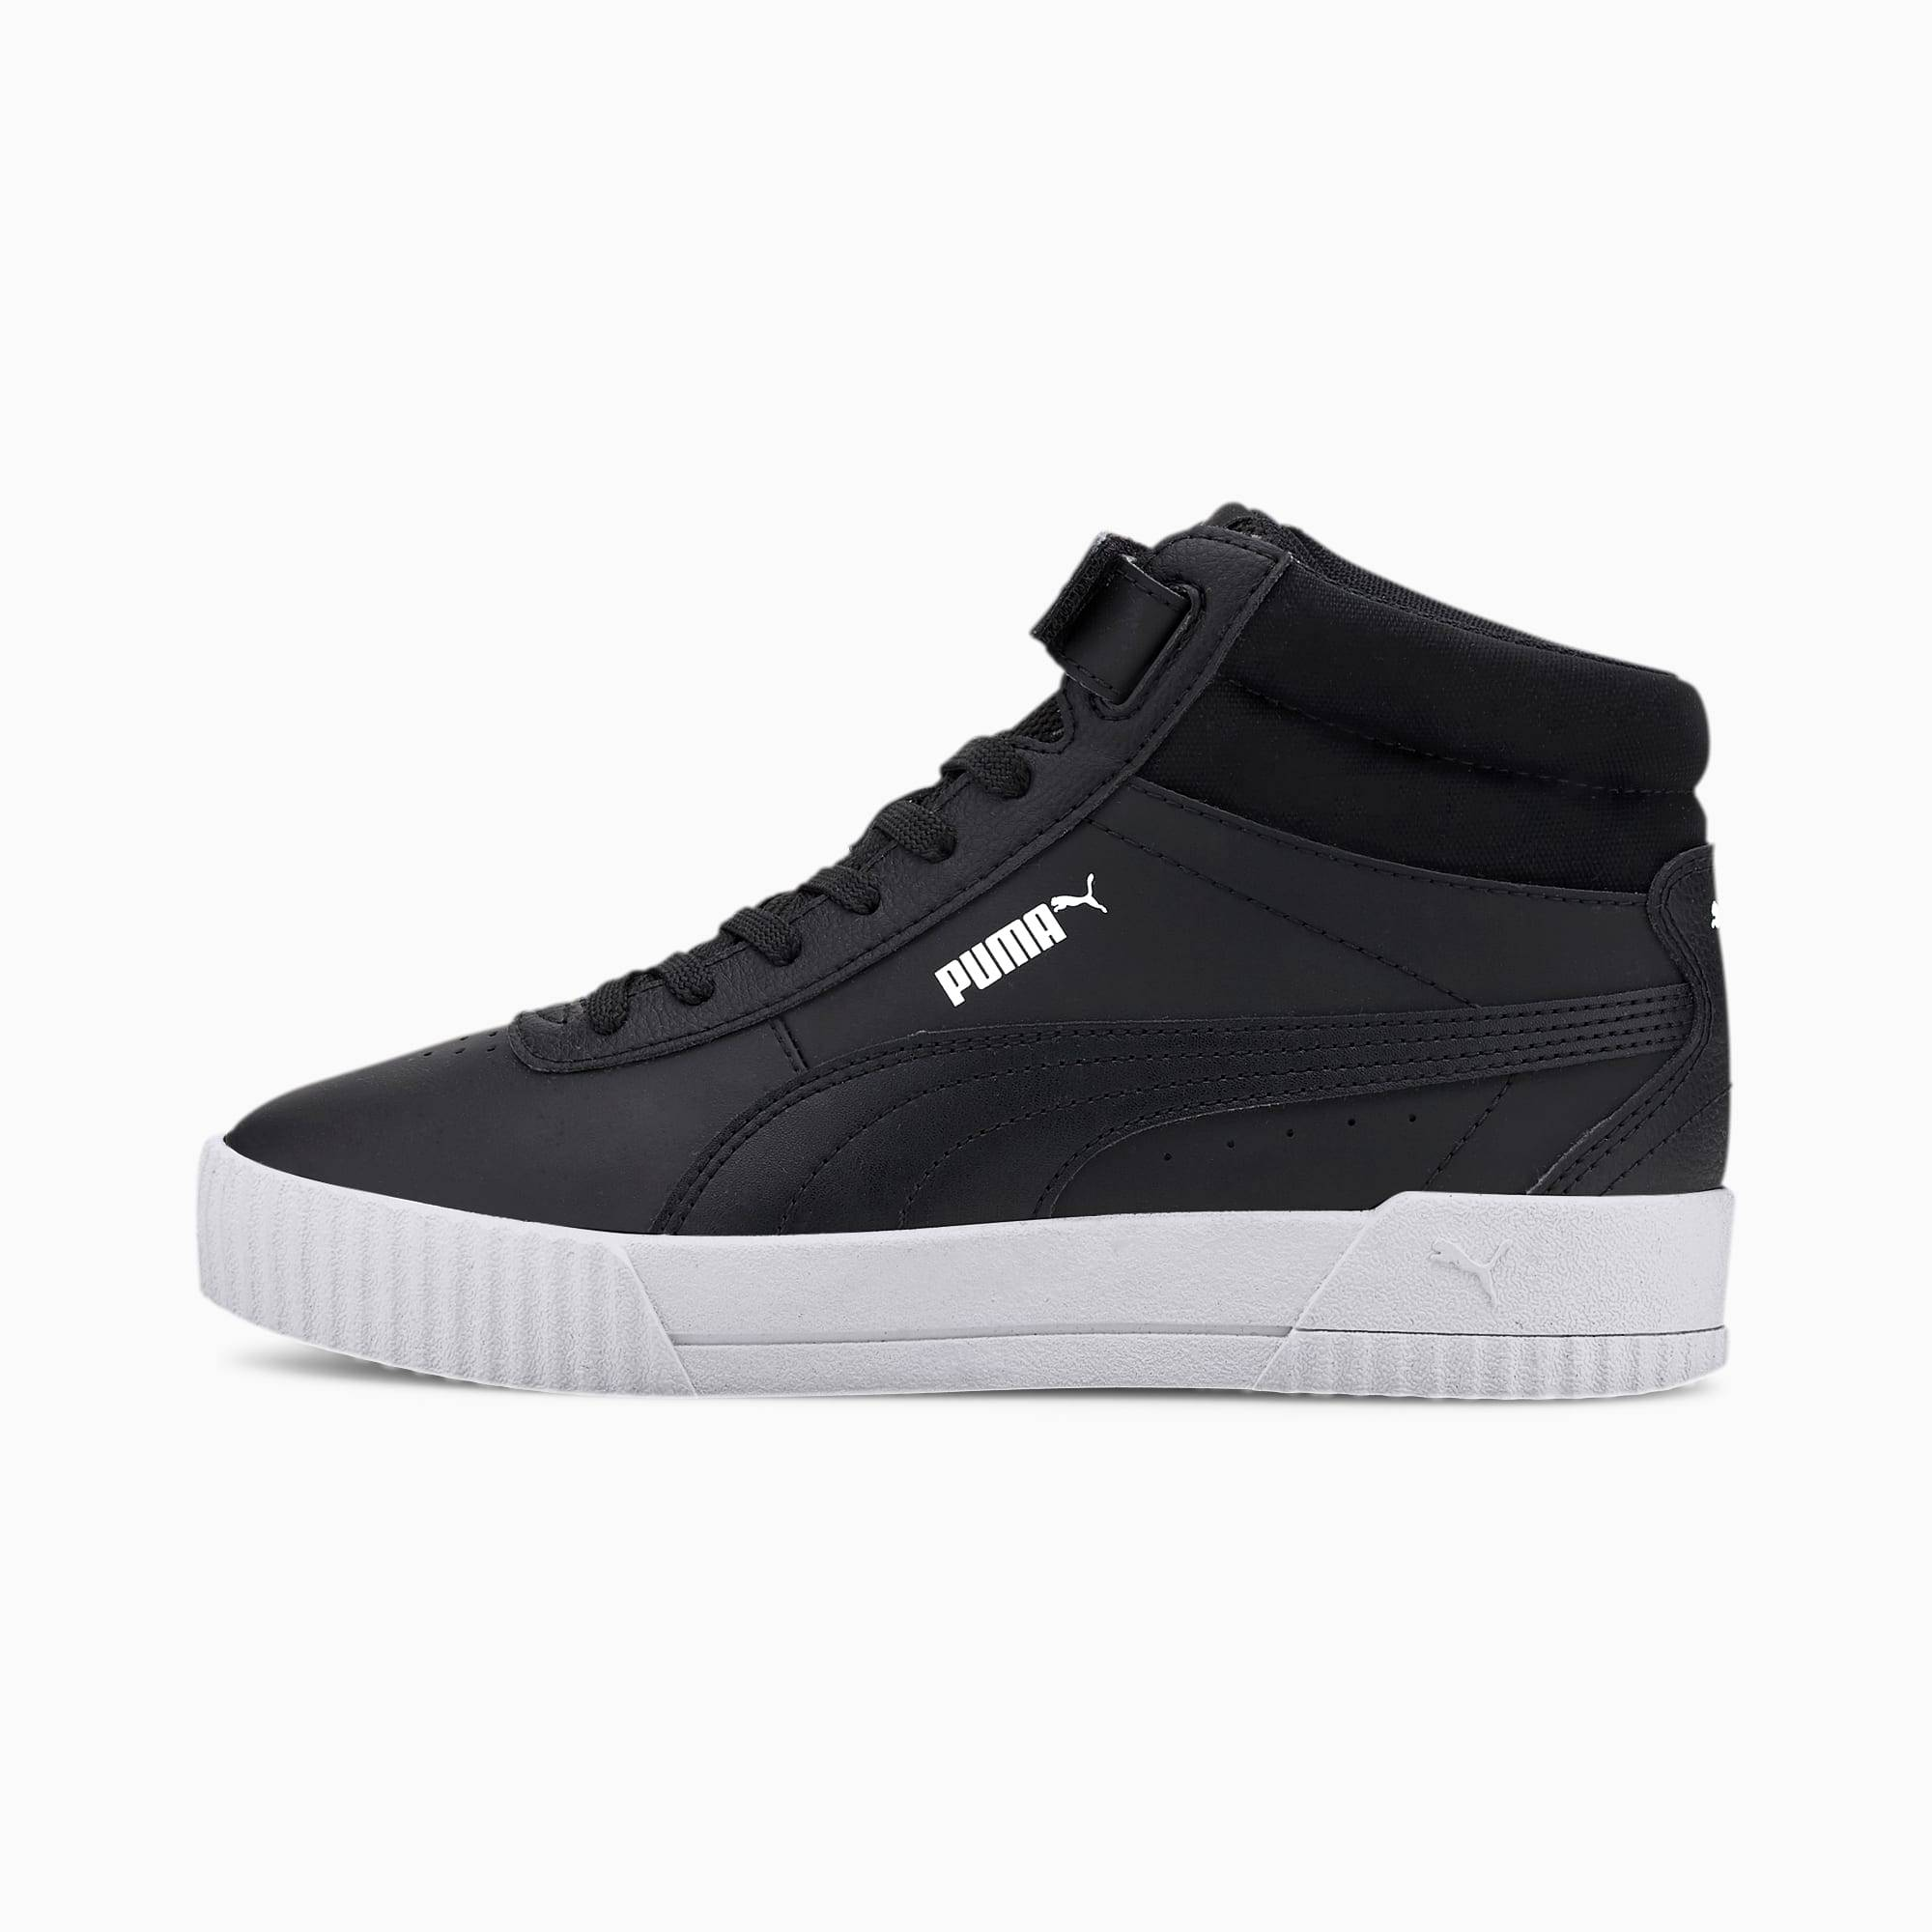 PUMA Chaussure Basket montante Carina femme, Noir, Taille 38.5, Chaussures